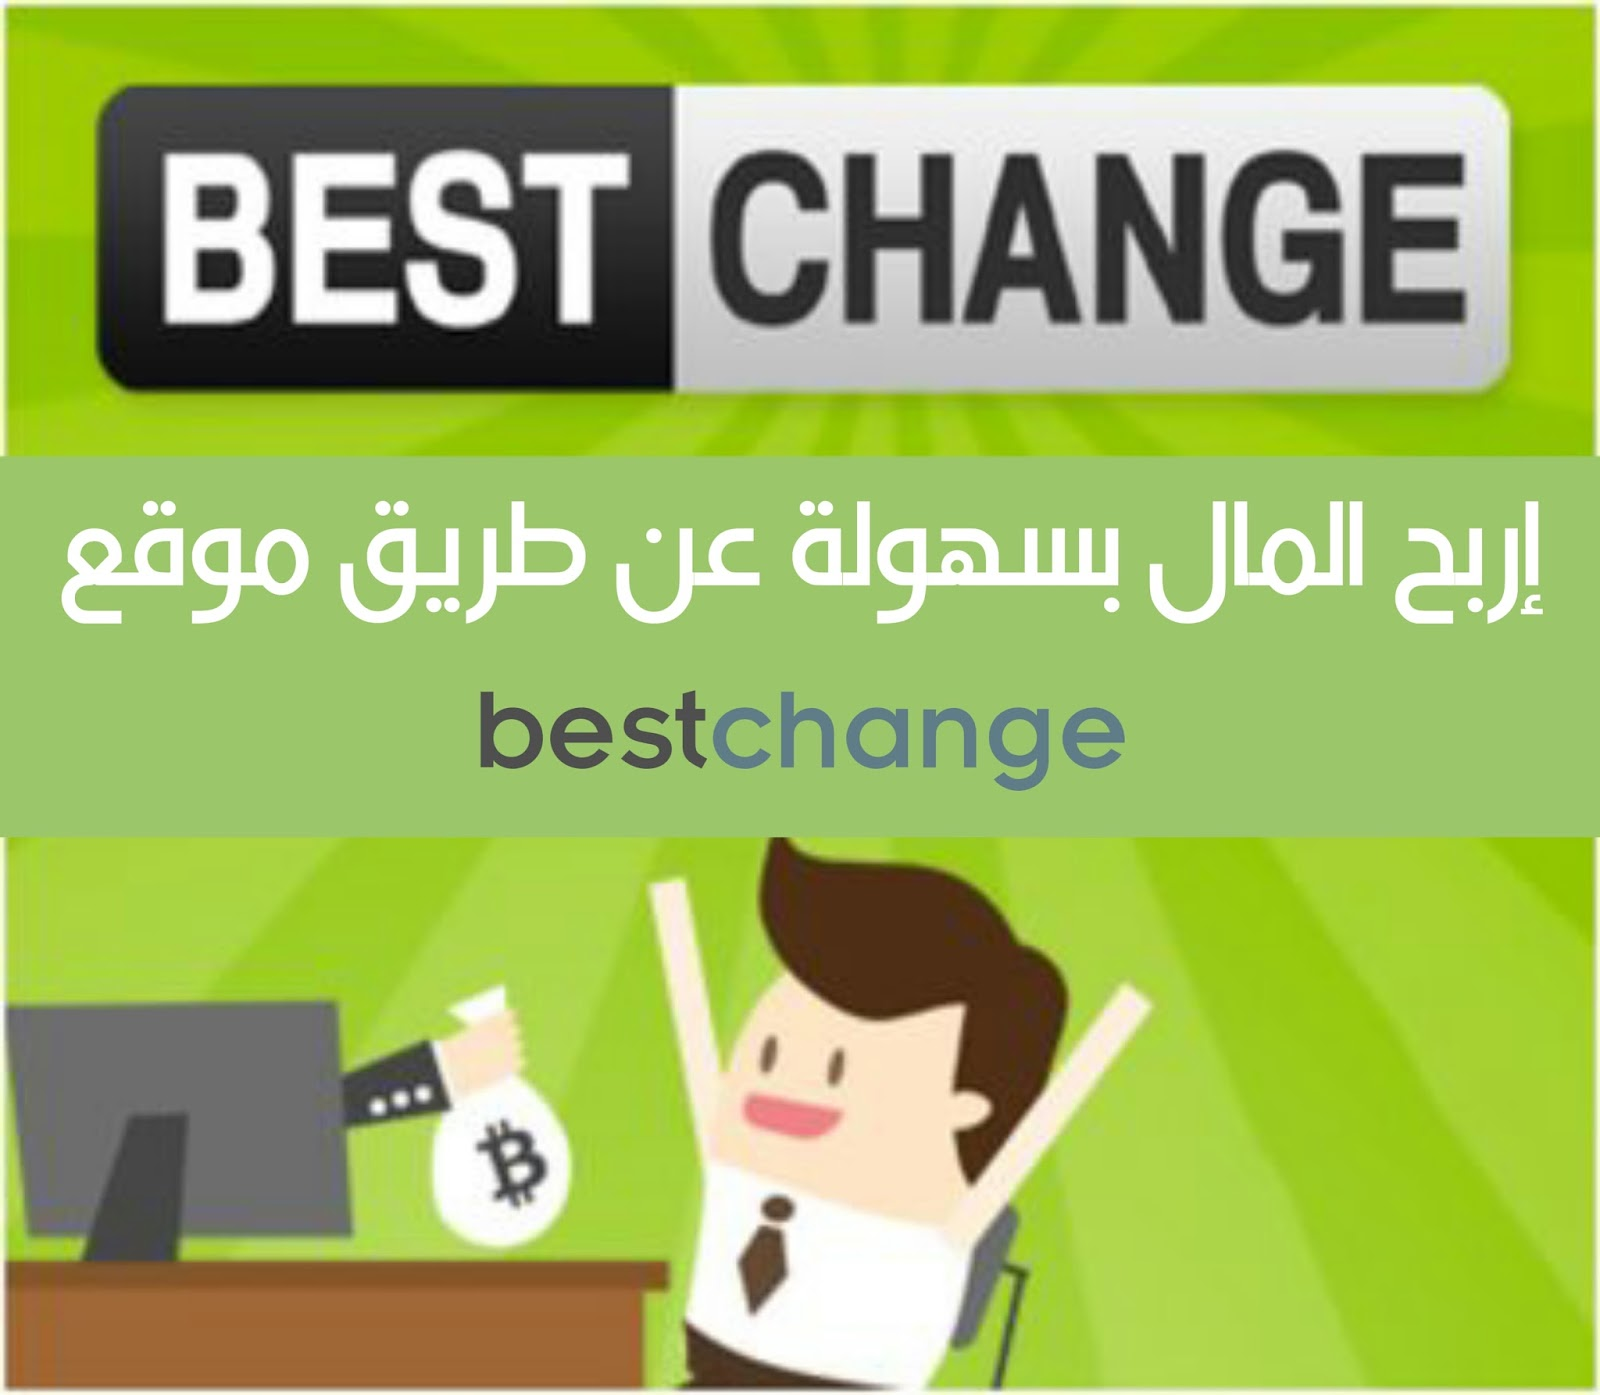 شرح موقع bestchange لربح 10 دولار يوميا